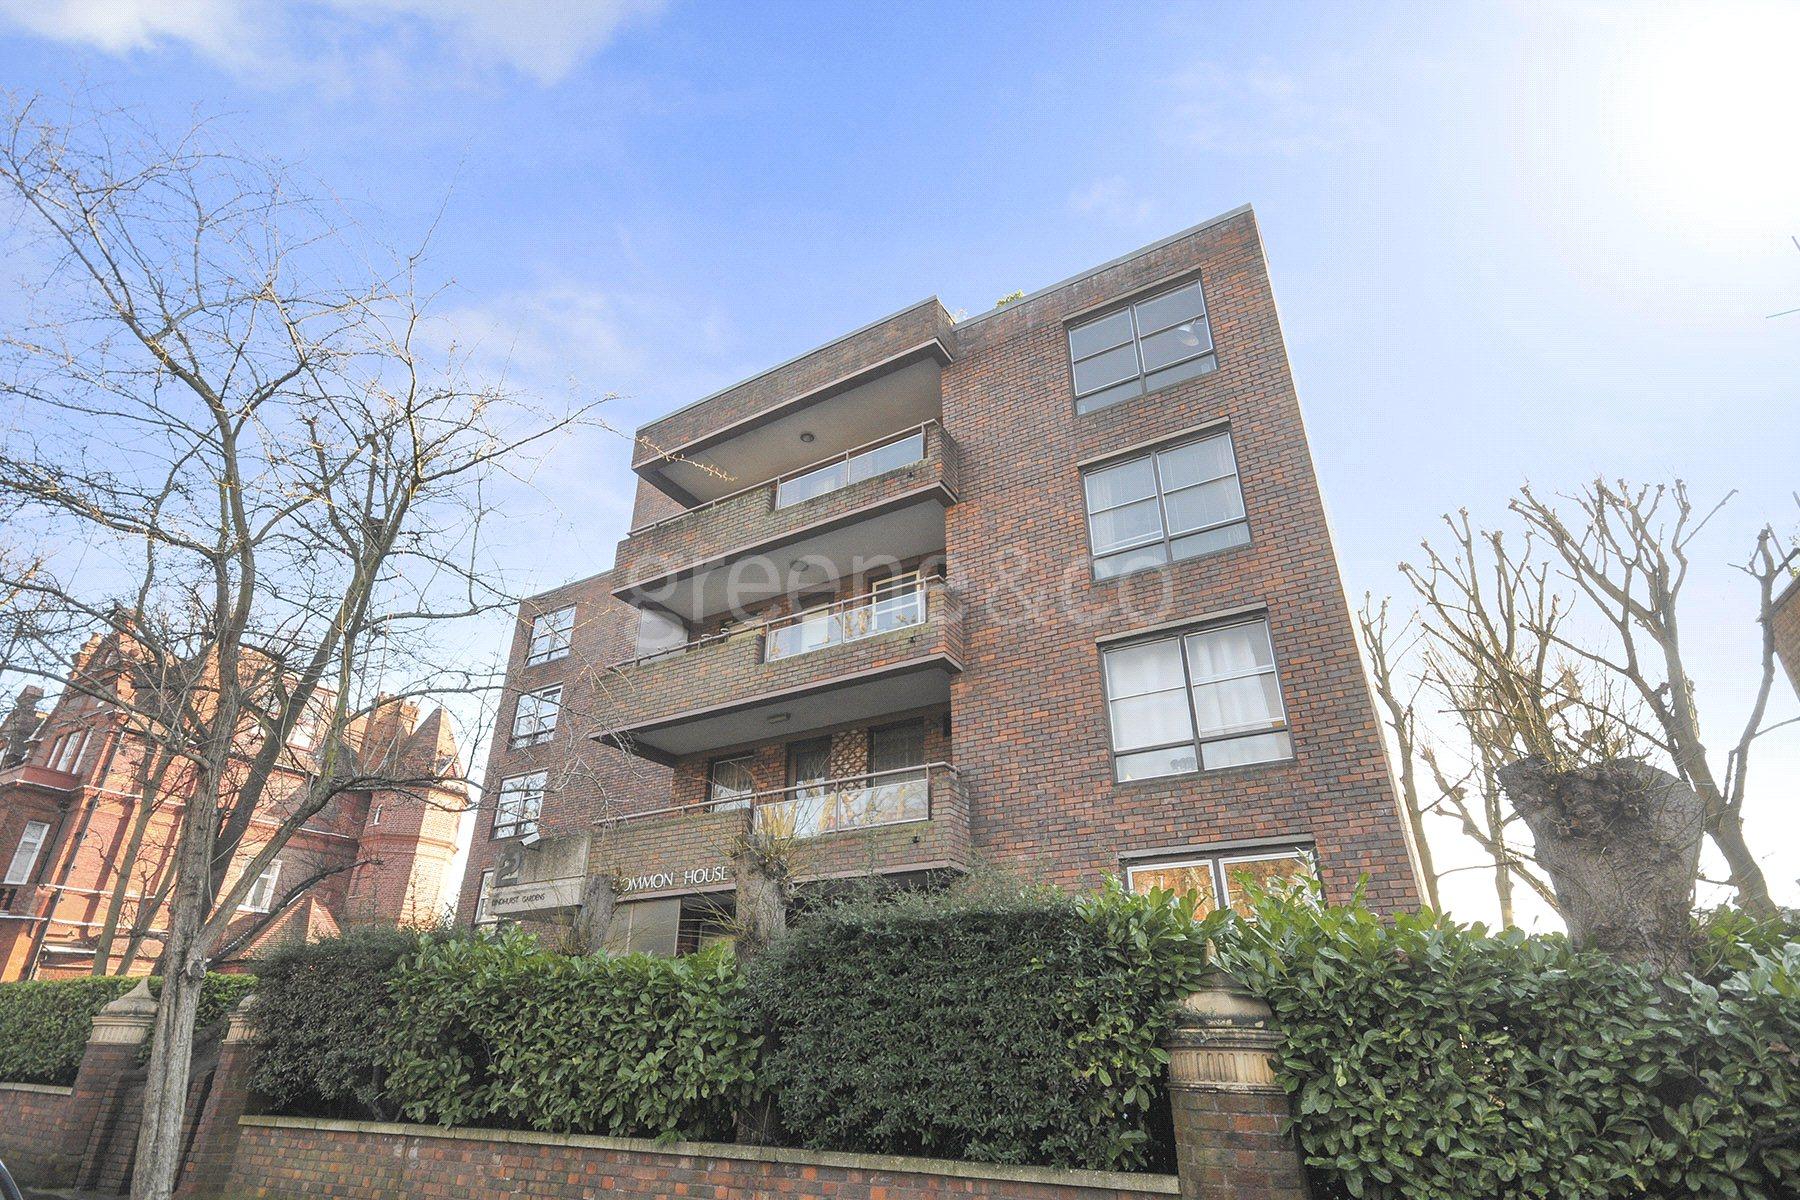 3 Bedrooms Flat for sale in Lyndhurst Gardens, Belsize Park, London, NW3